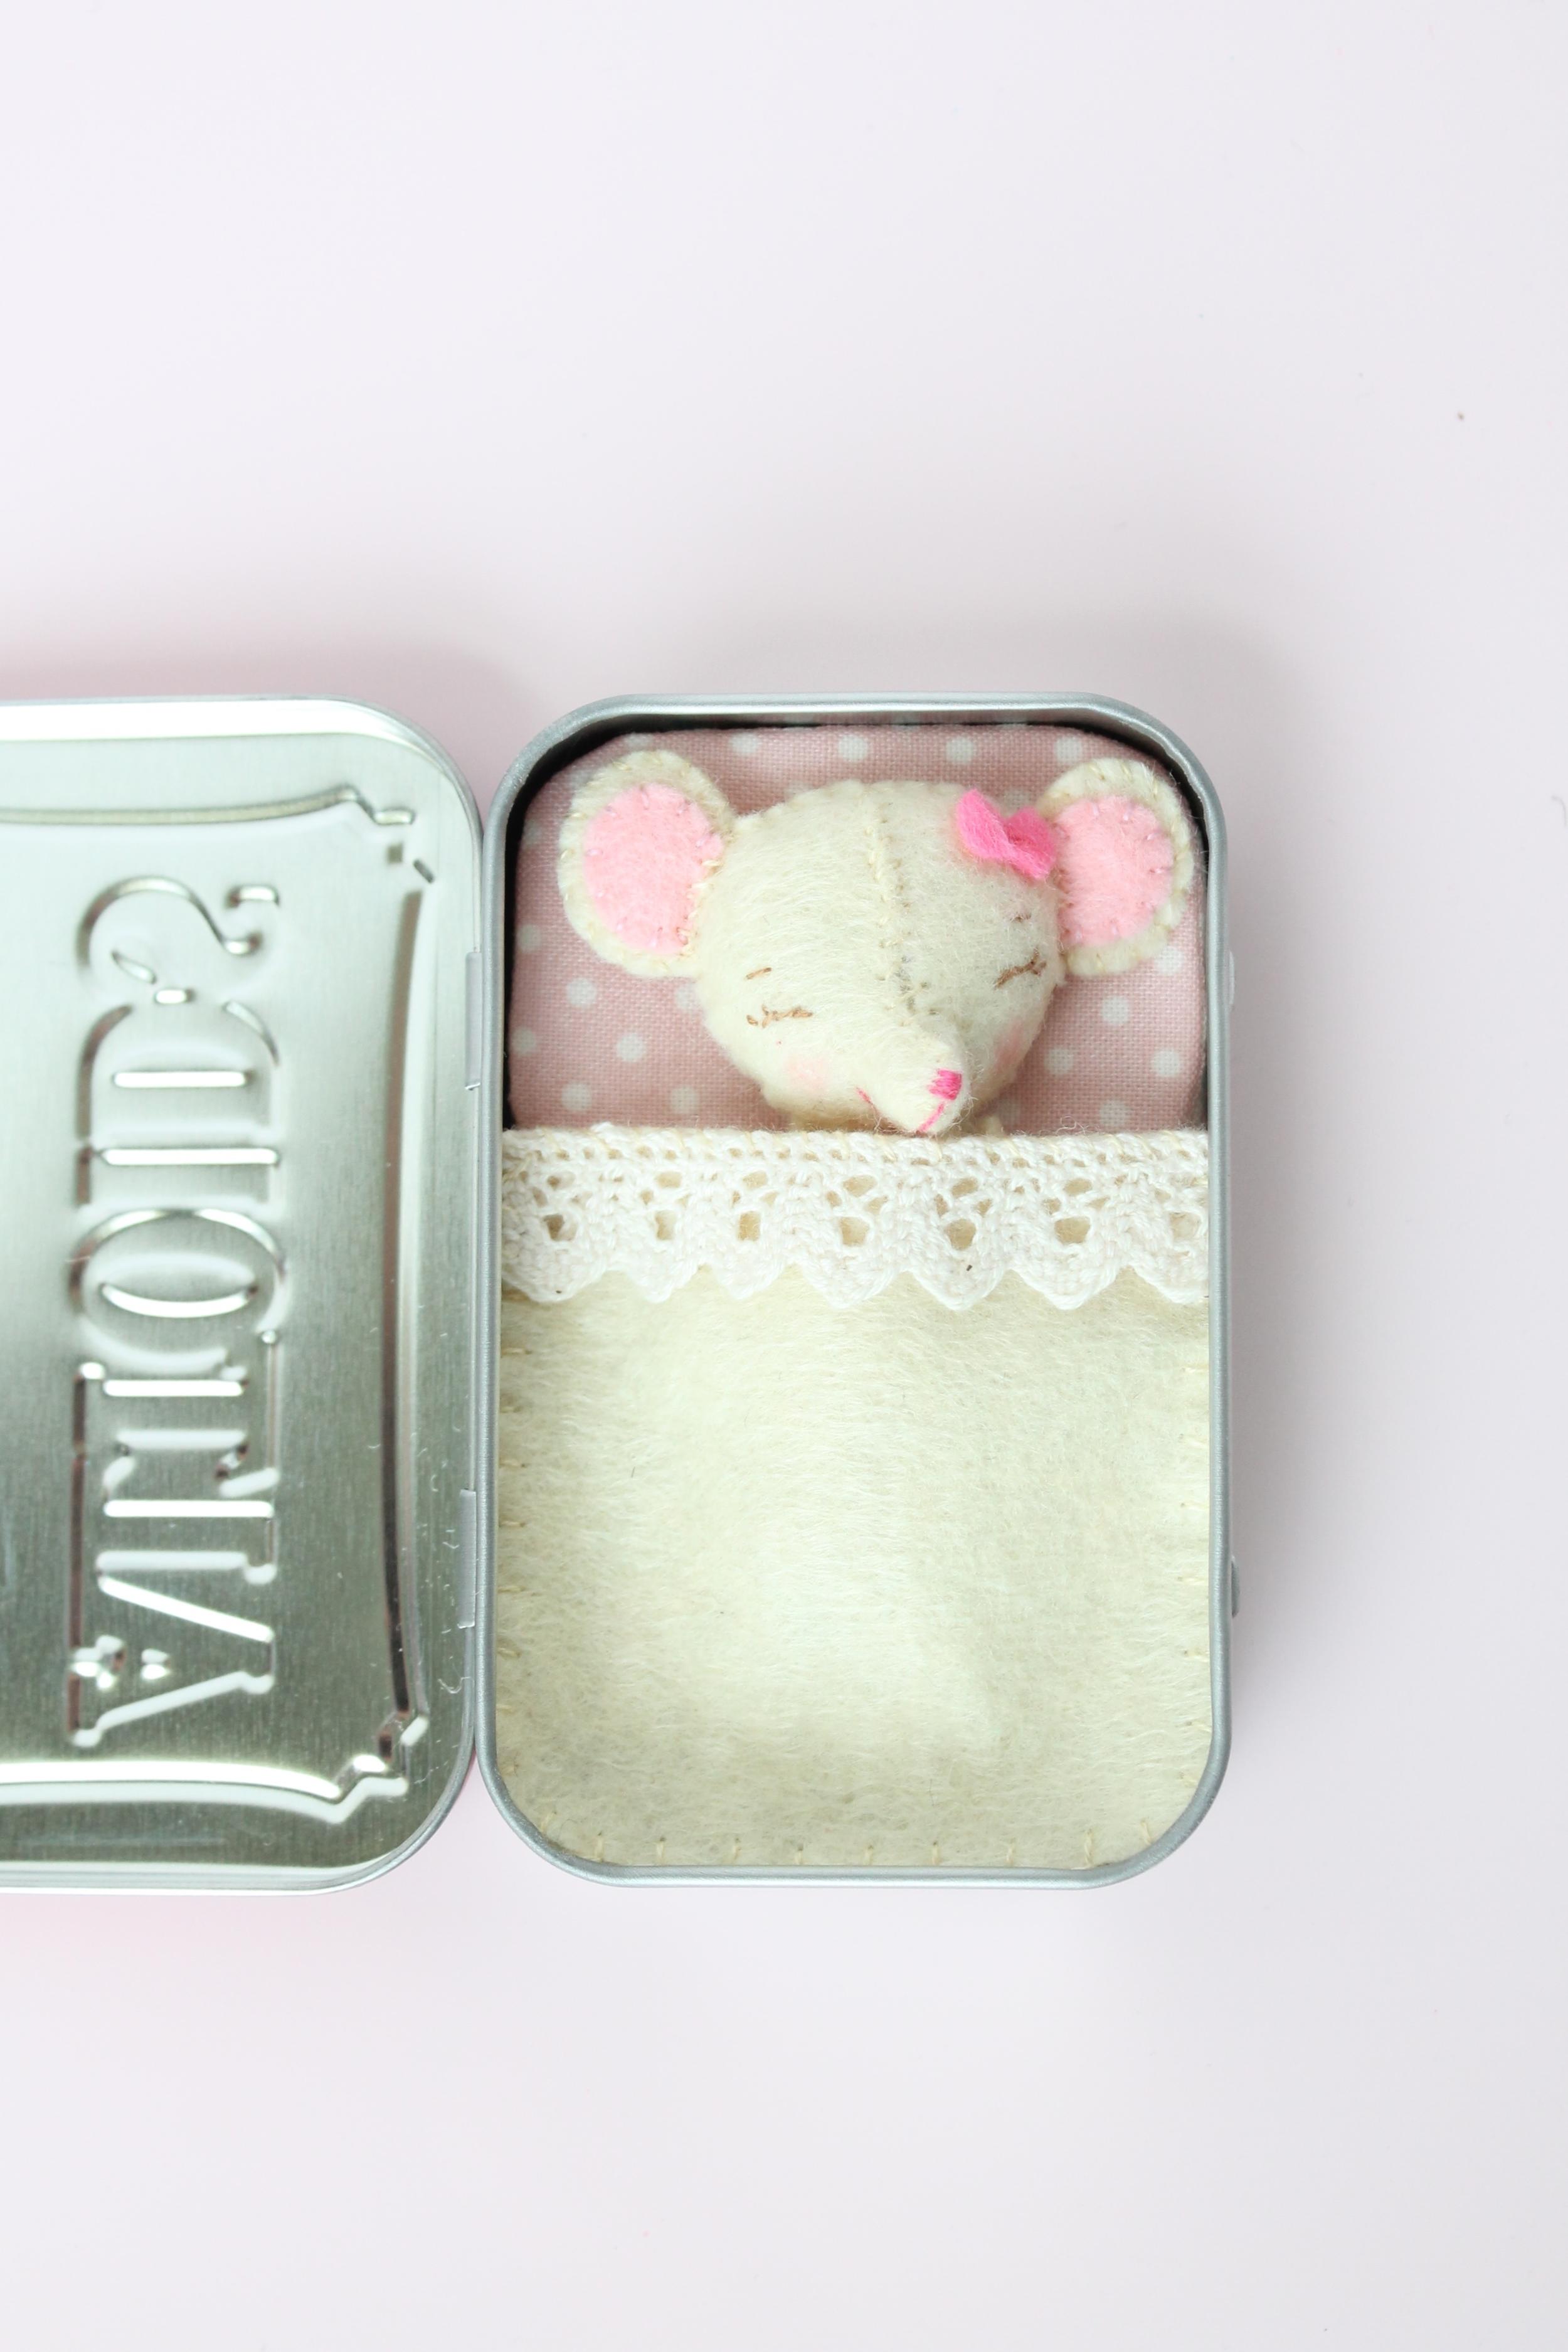 Tutorial for a little felt mouse in an Altoids tin.